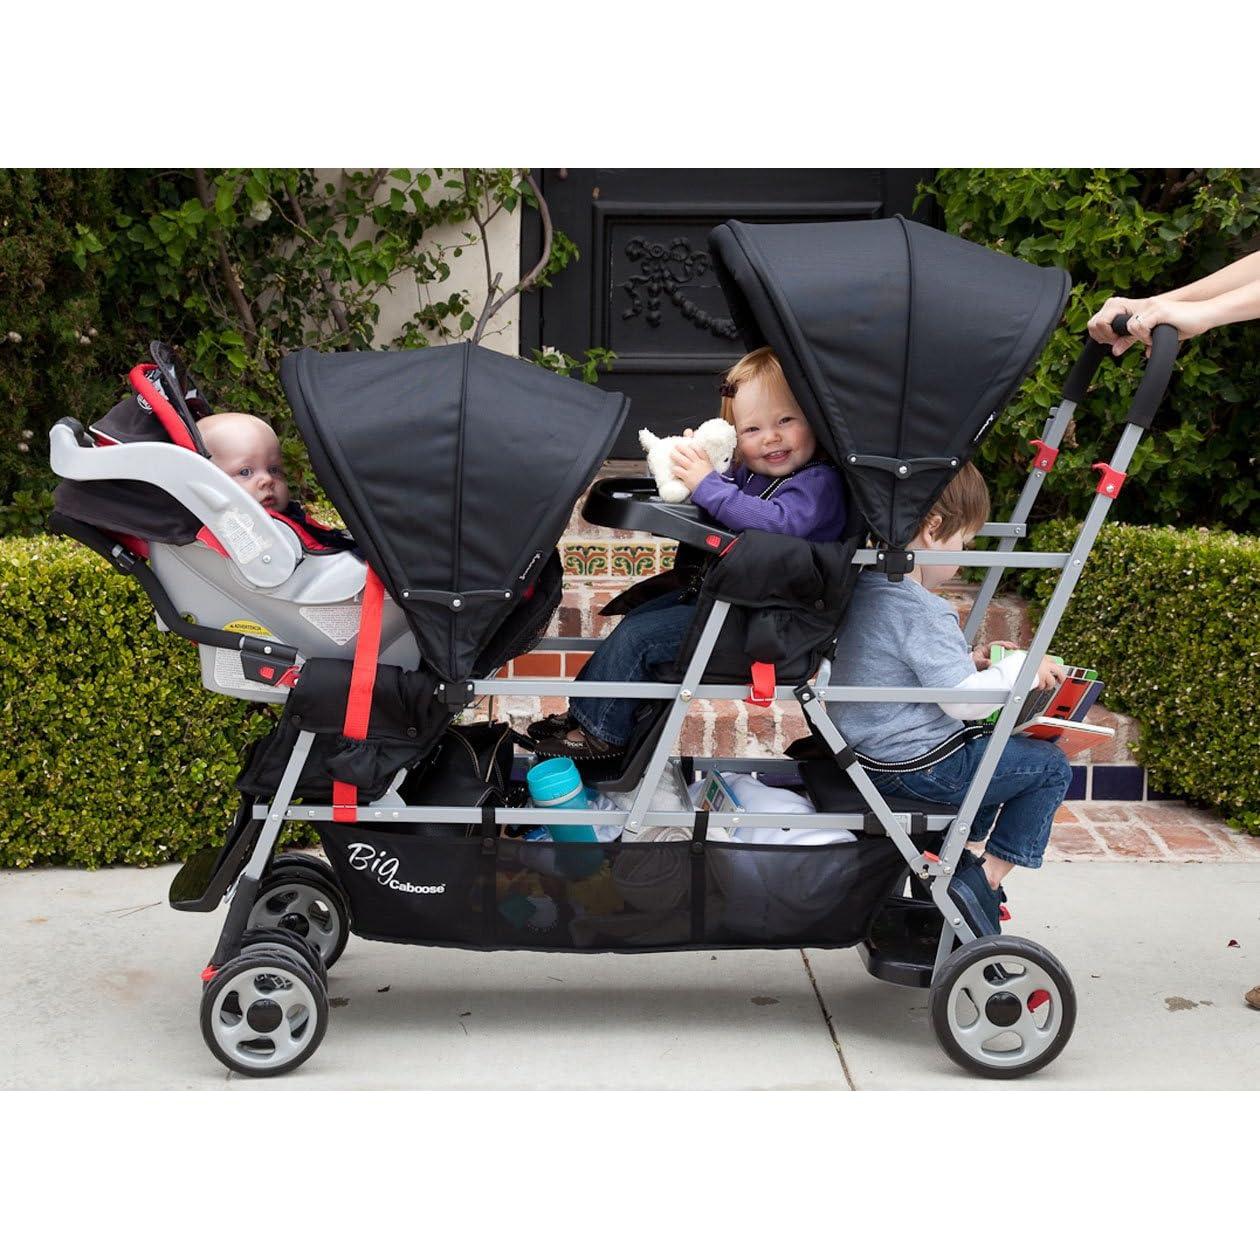 Stroller for 1-year old twins plus newborn? - BabyCenter